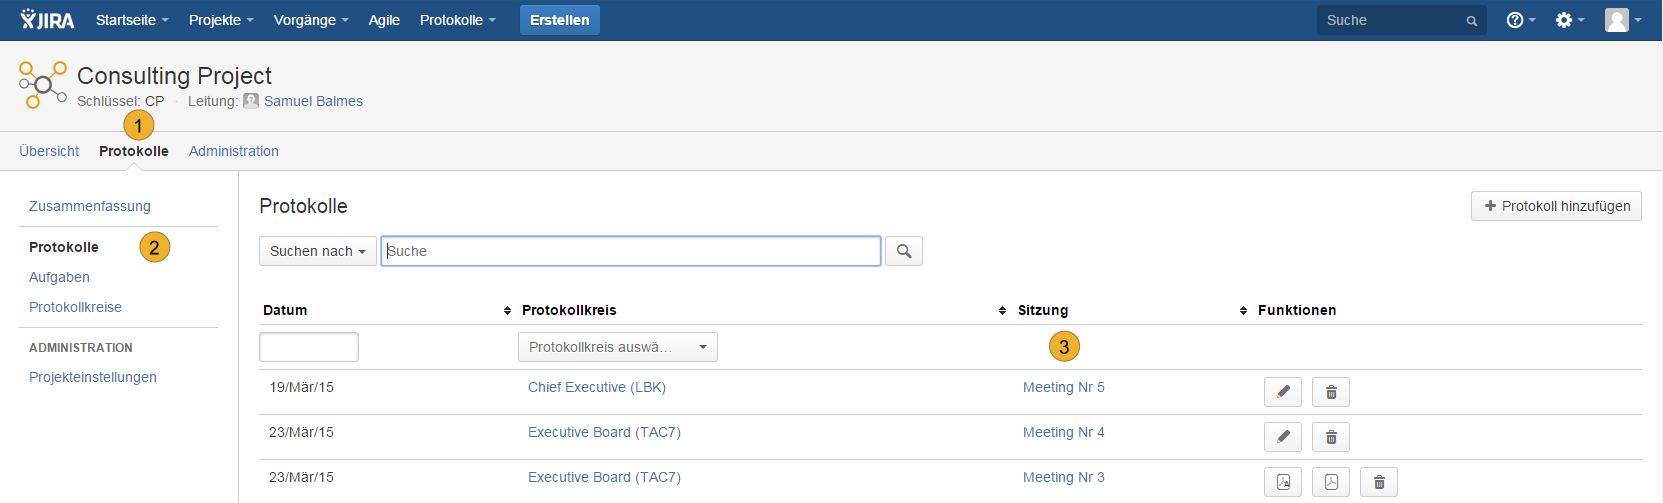 AgileMinutes - Übersicht Protokolle / Besprechungen